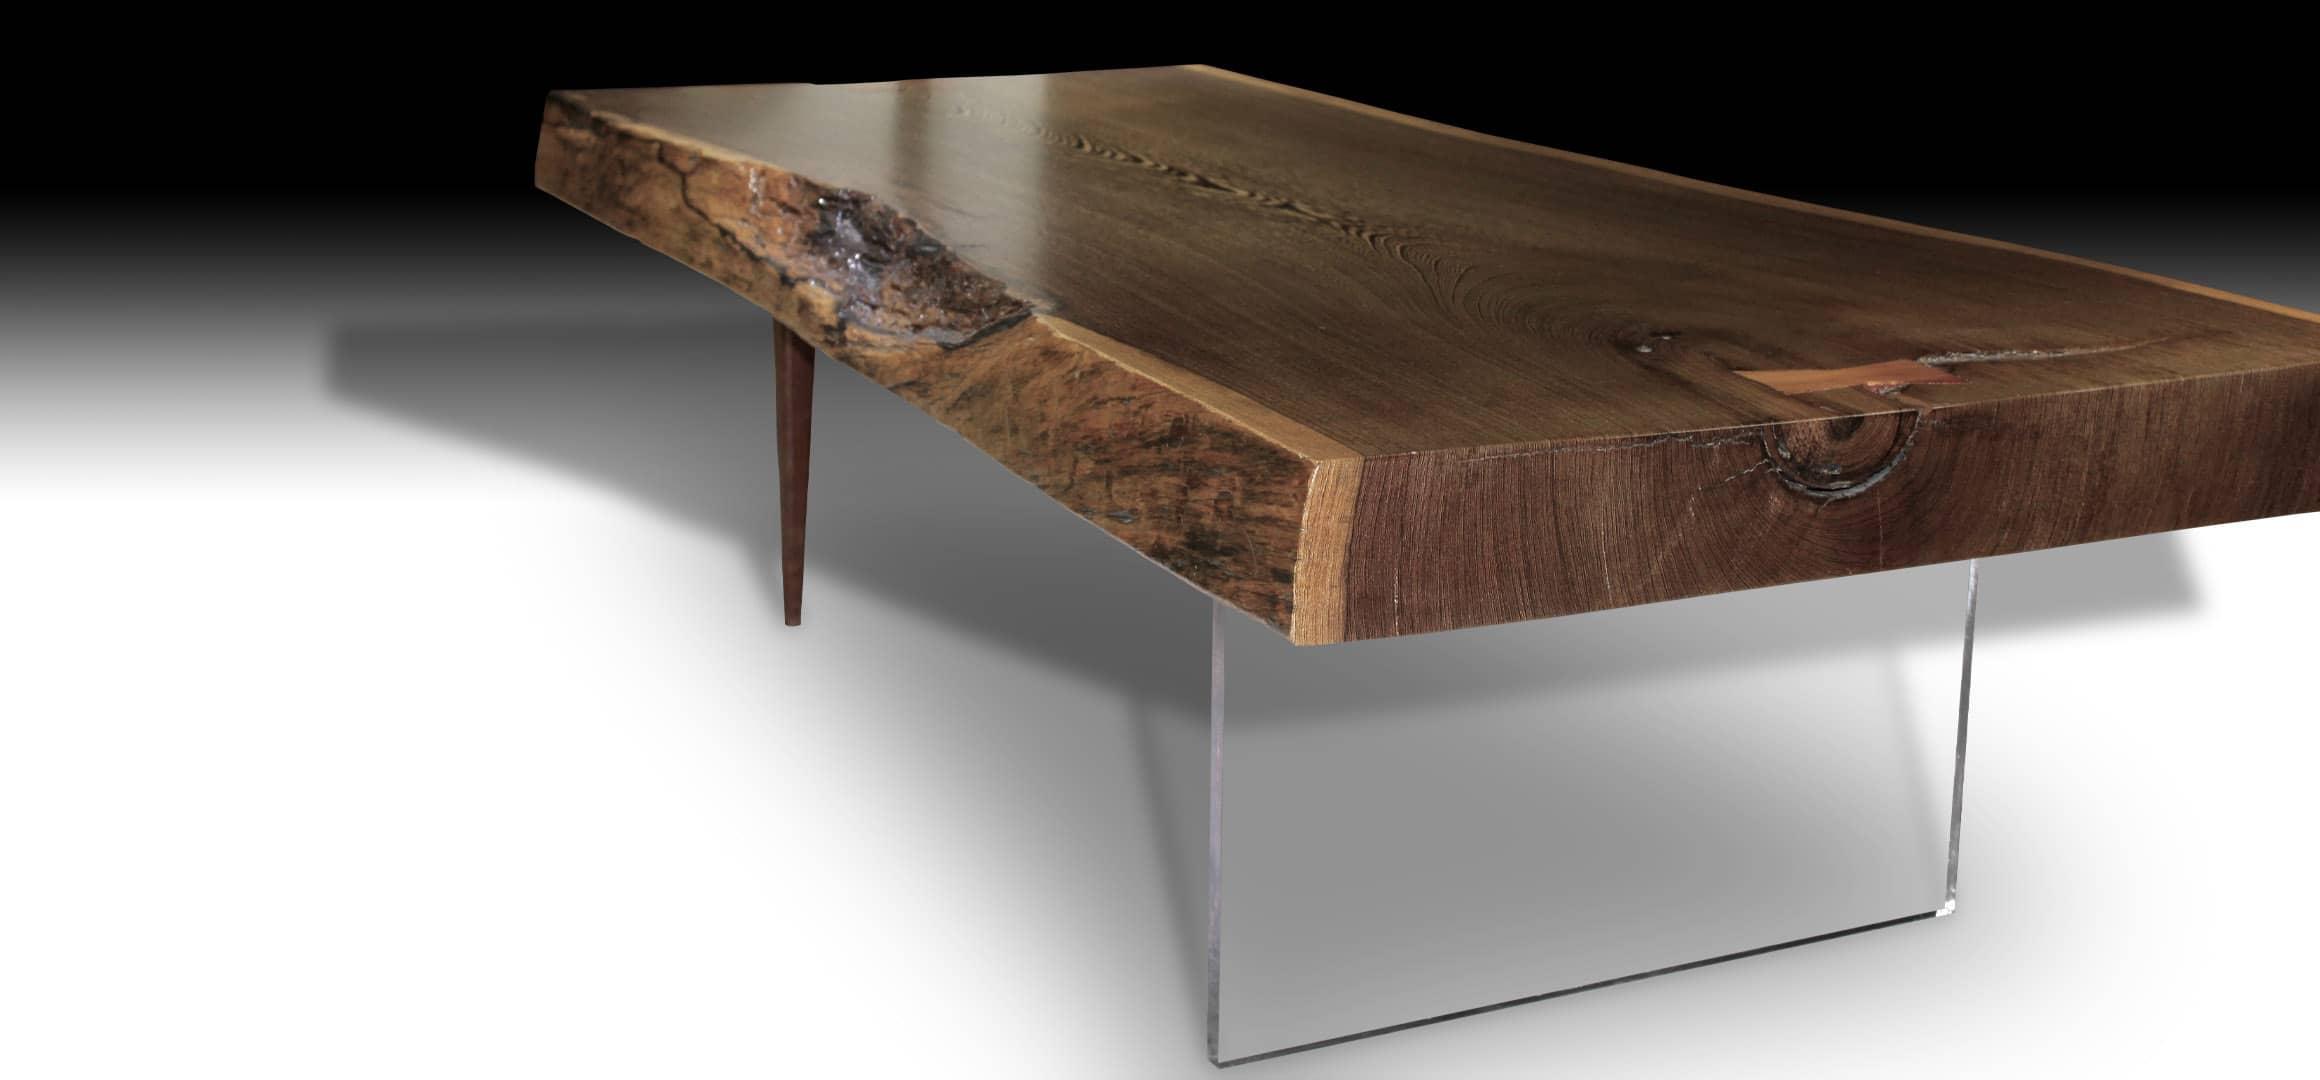 Animal live edge walnut wood coffee table with teak wood pencil legs and glass base